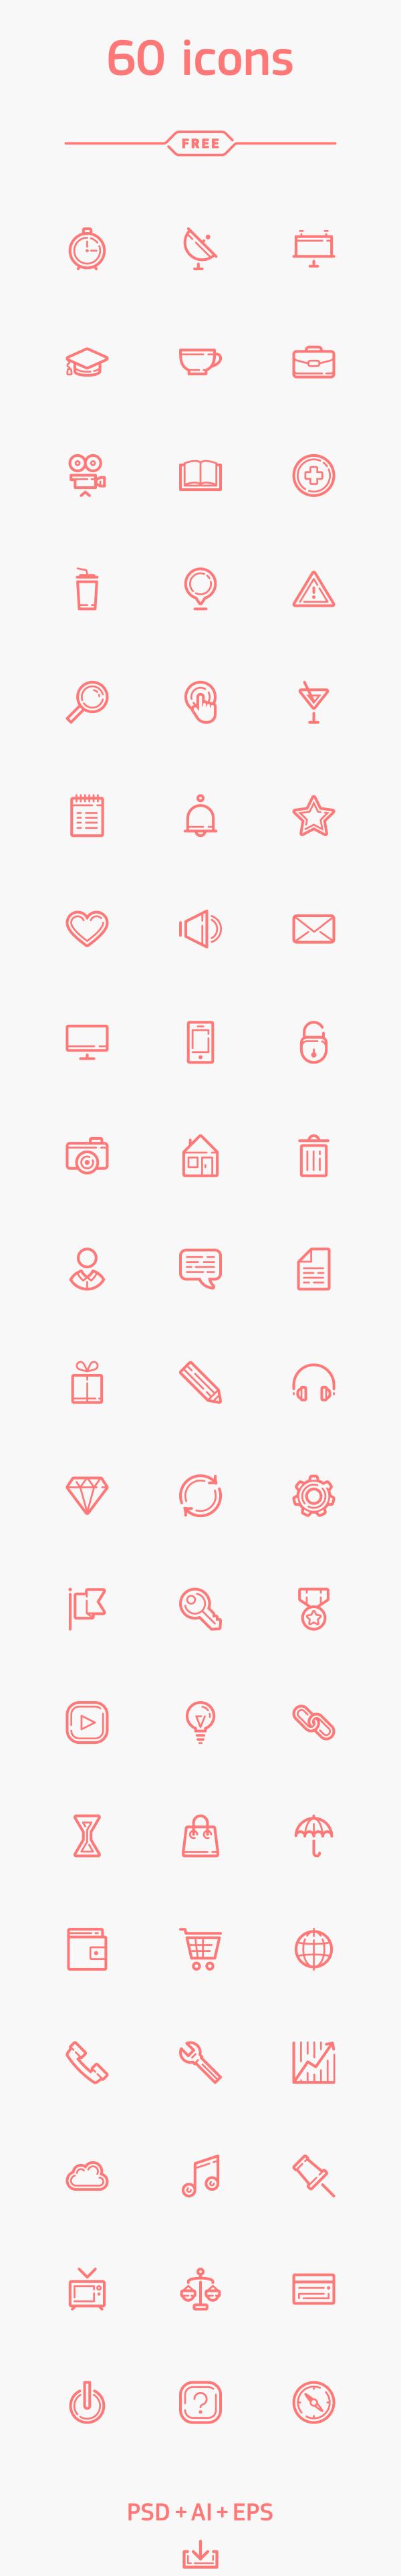 16-60-free-icons